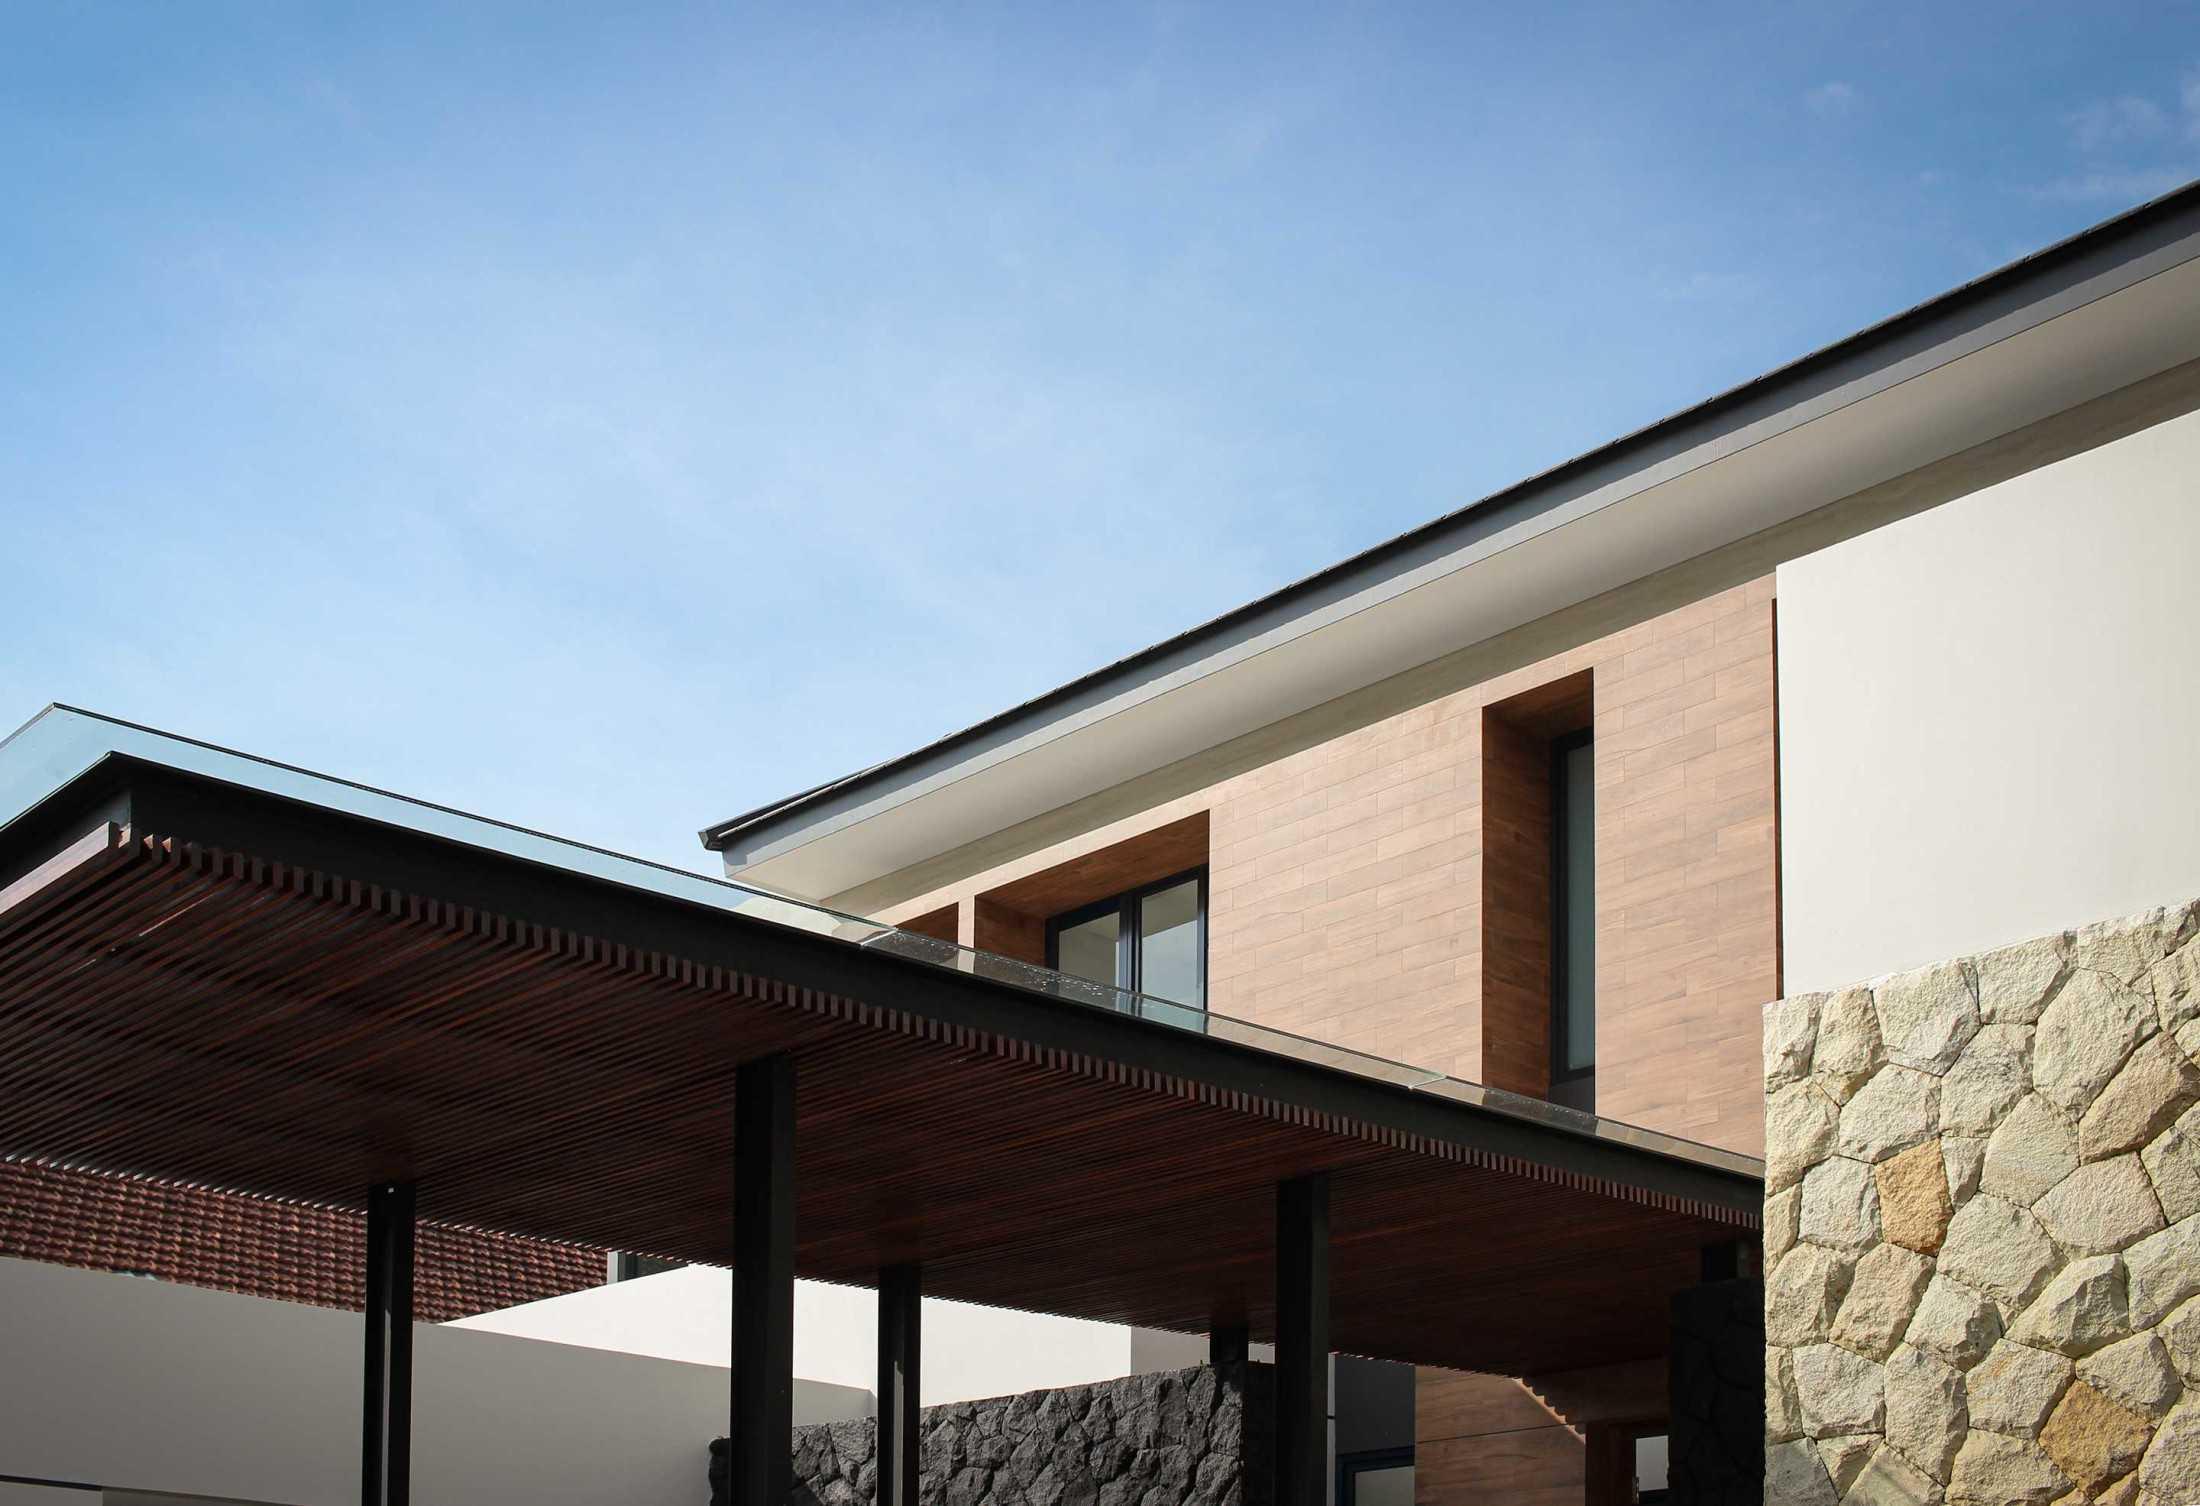 Y0 Design Architect S House Kec. Srono, Kabupaten Banyuwangi, Jawa Timur, Indonesia Kec. Srono, Kabupaten Banyuwangi, Jawa Timur, Indonesia Yohanes-Iswara-Limandjaya-S-House  121091